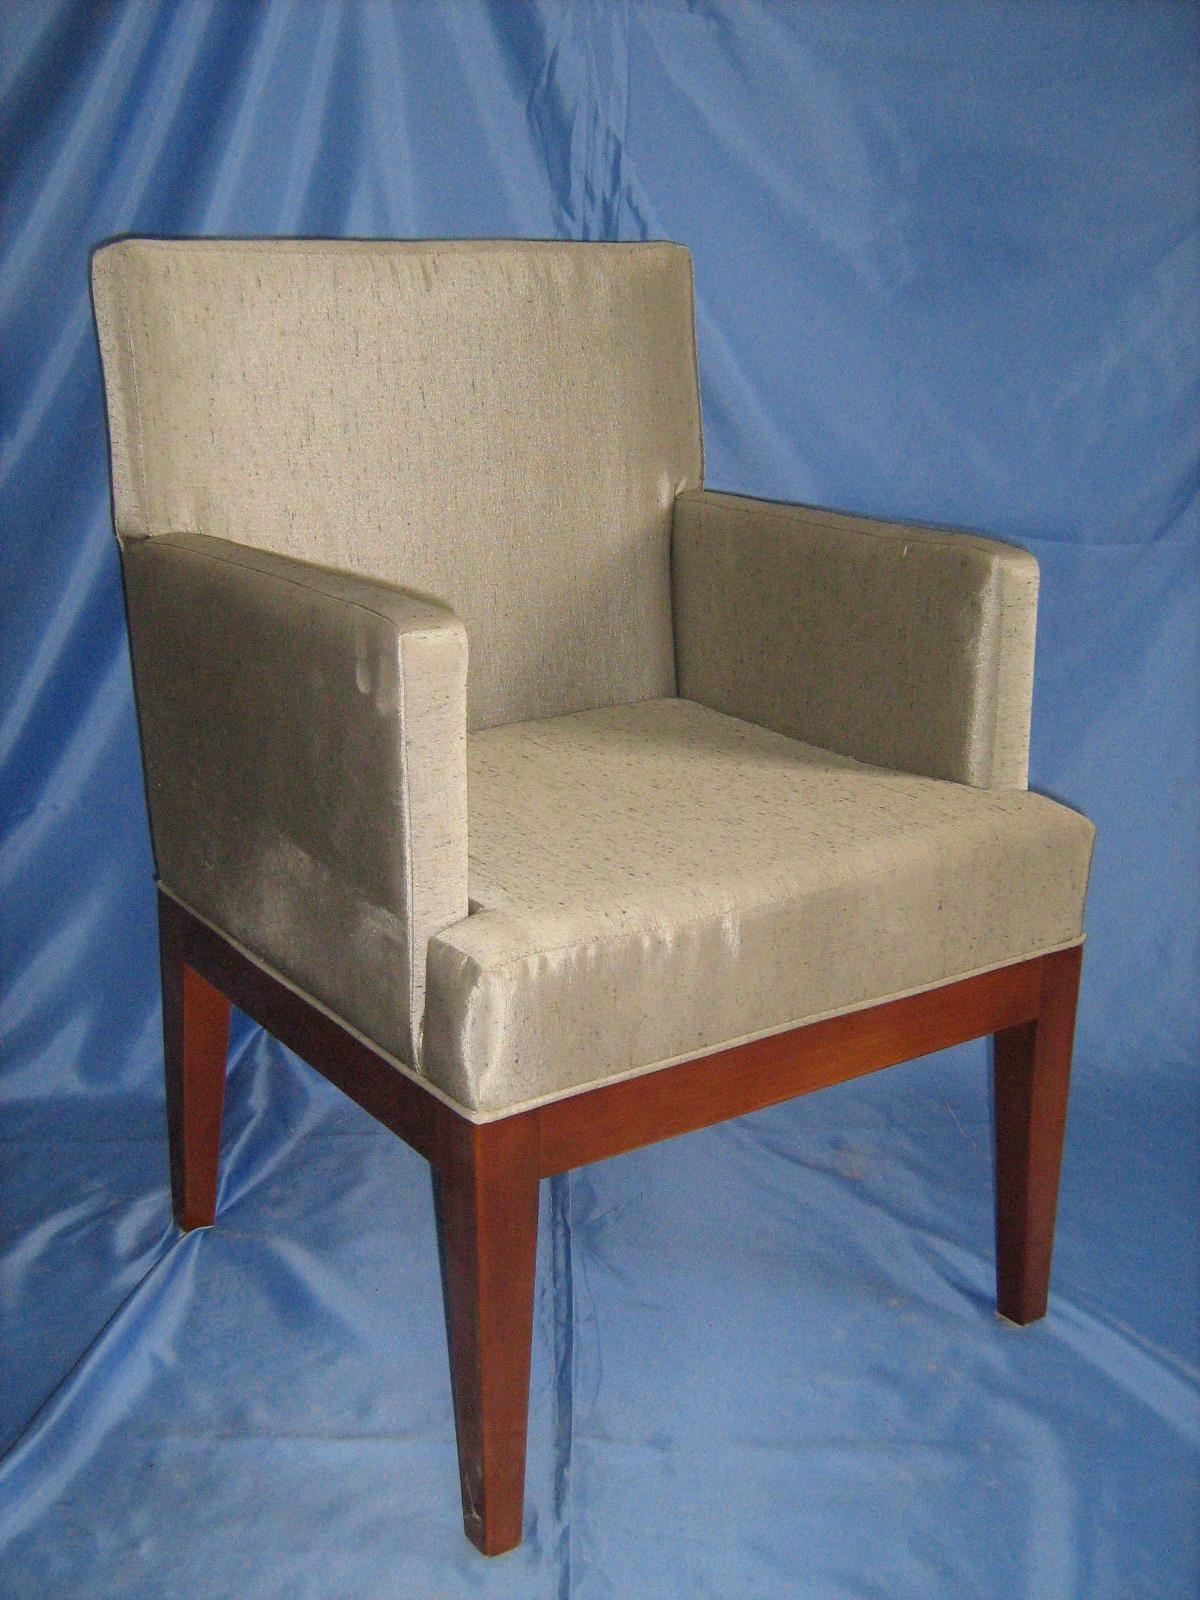 mesas cadeiras cadeiras cadeiras de madeira cadeira cadeira de madeira  #304B74 1200x1600